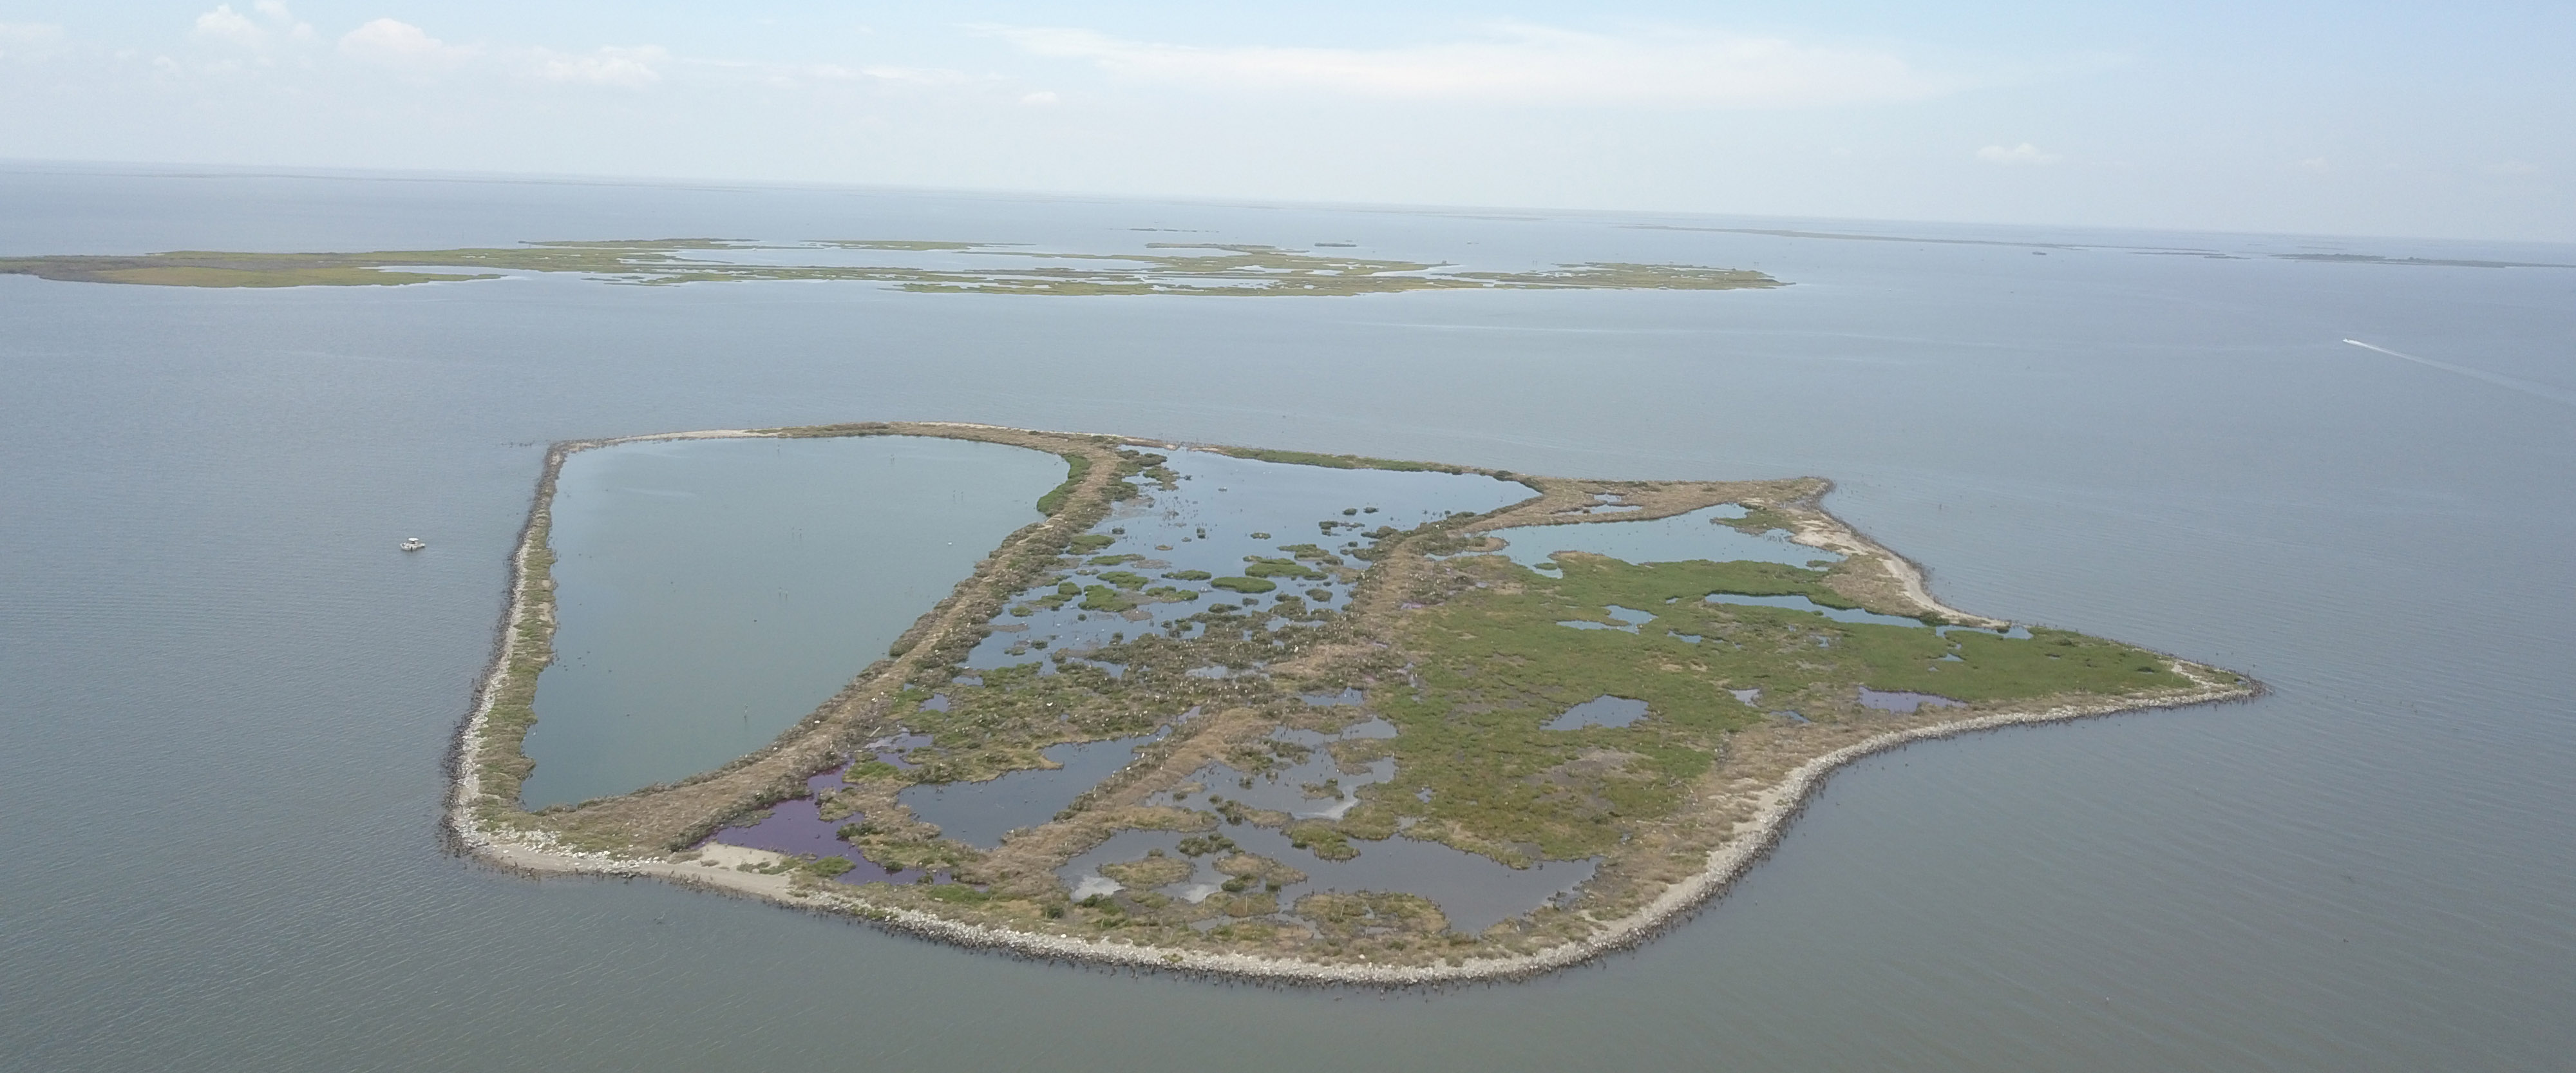 Louisiana Trustees Release Final Restoration Plan for Queen Bess Island